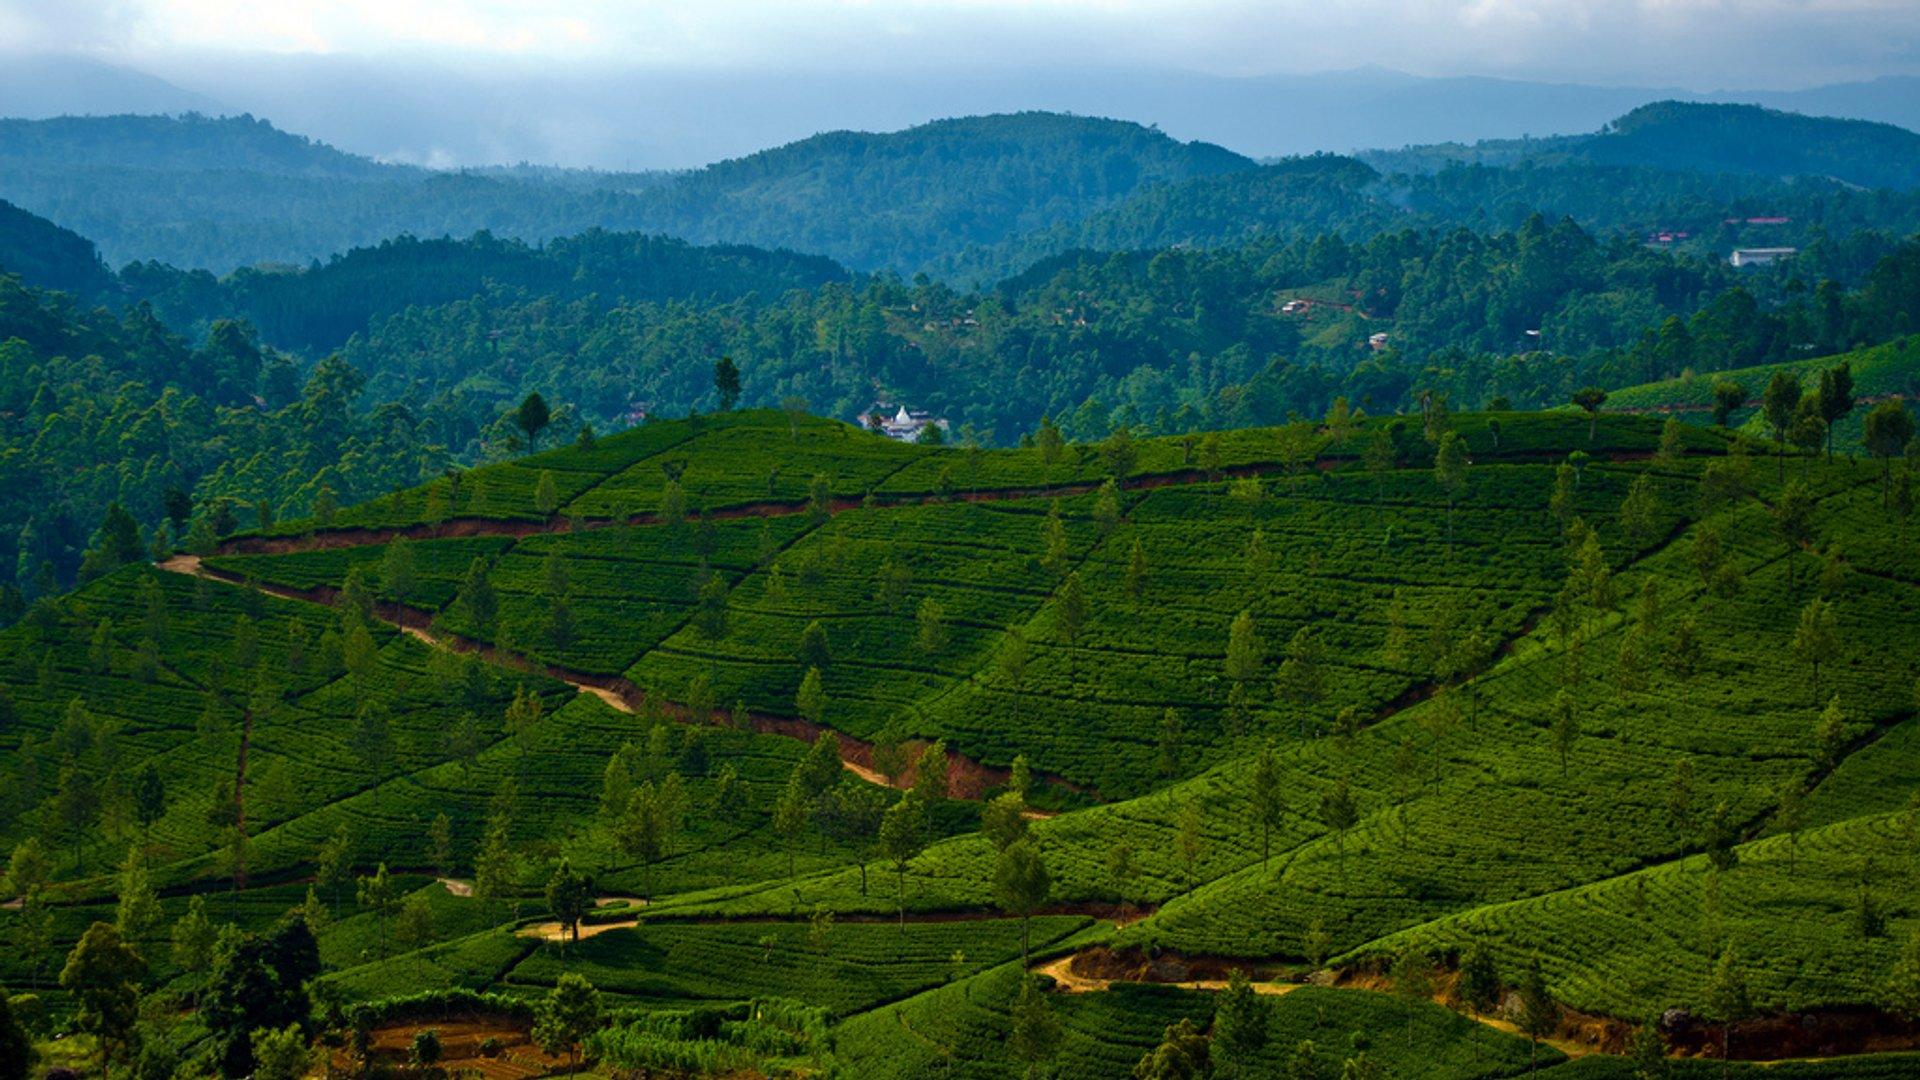 Uva Tea Harvest in Sri Lanka - Best Season